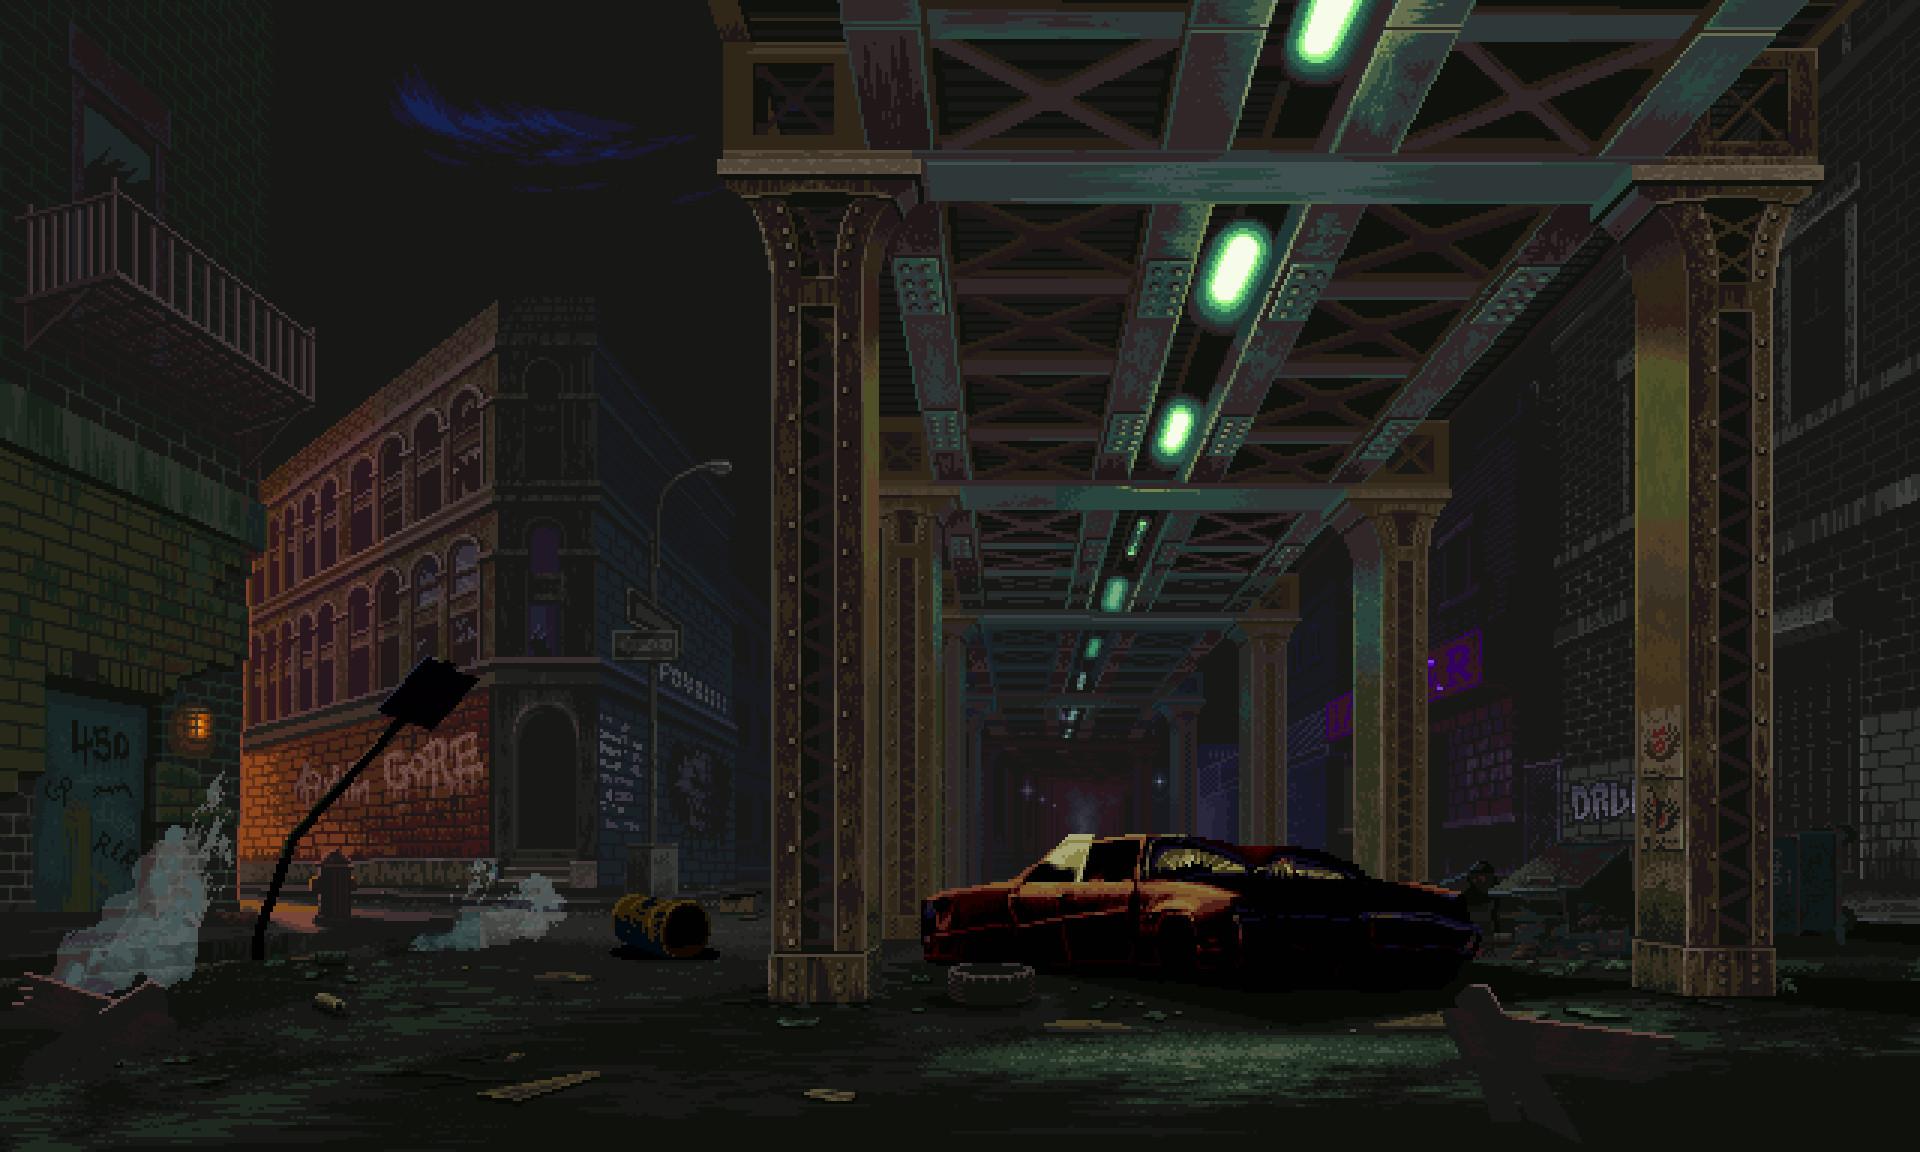 PffZV18.gif (1920×1152) | Cyberpunk | Pinterest | Cyberpunk and Pixel art  background